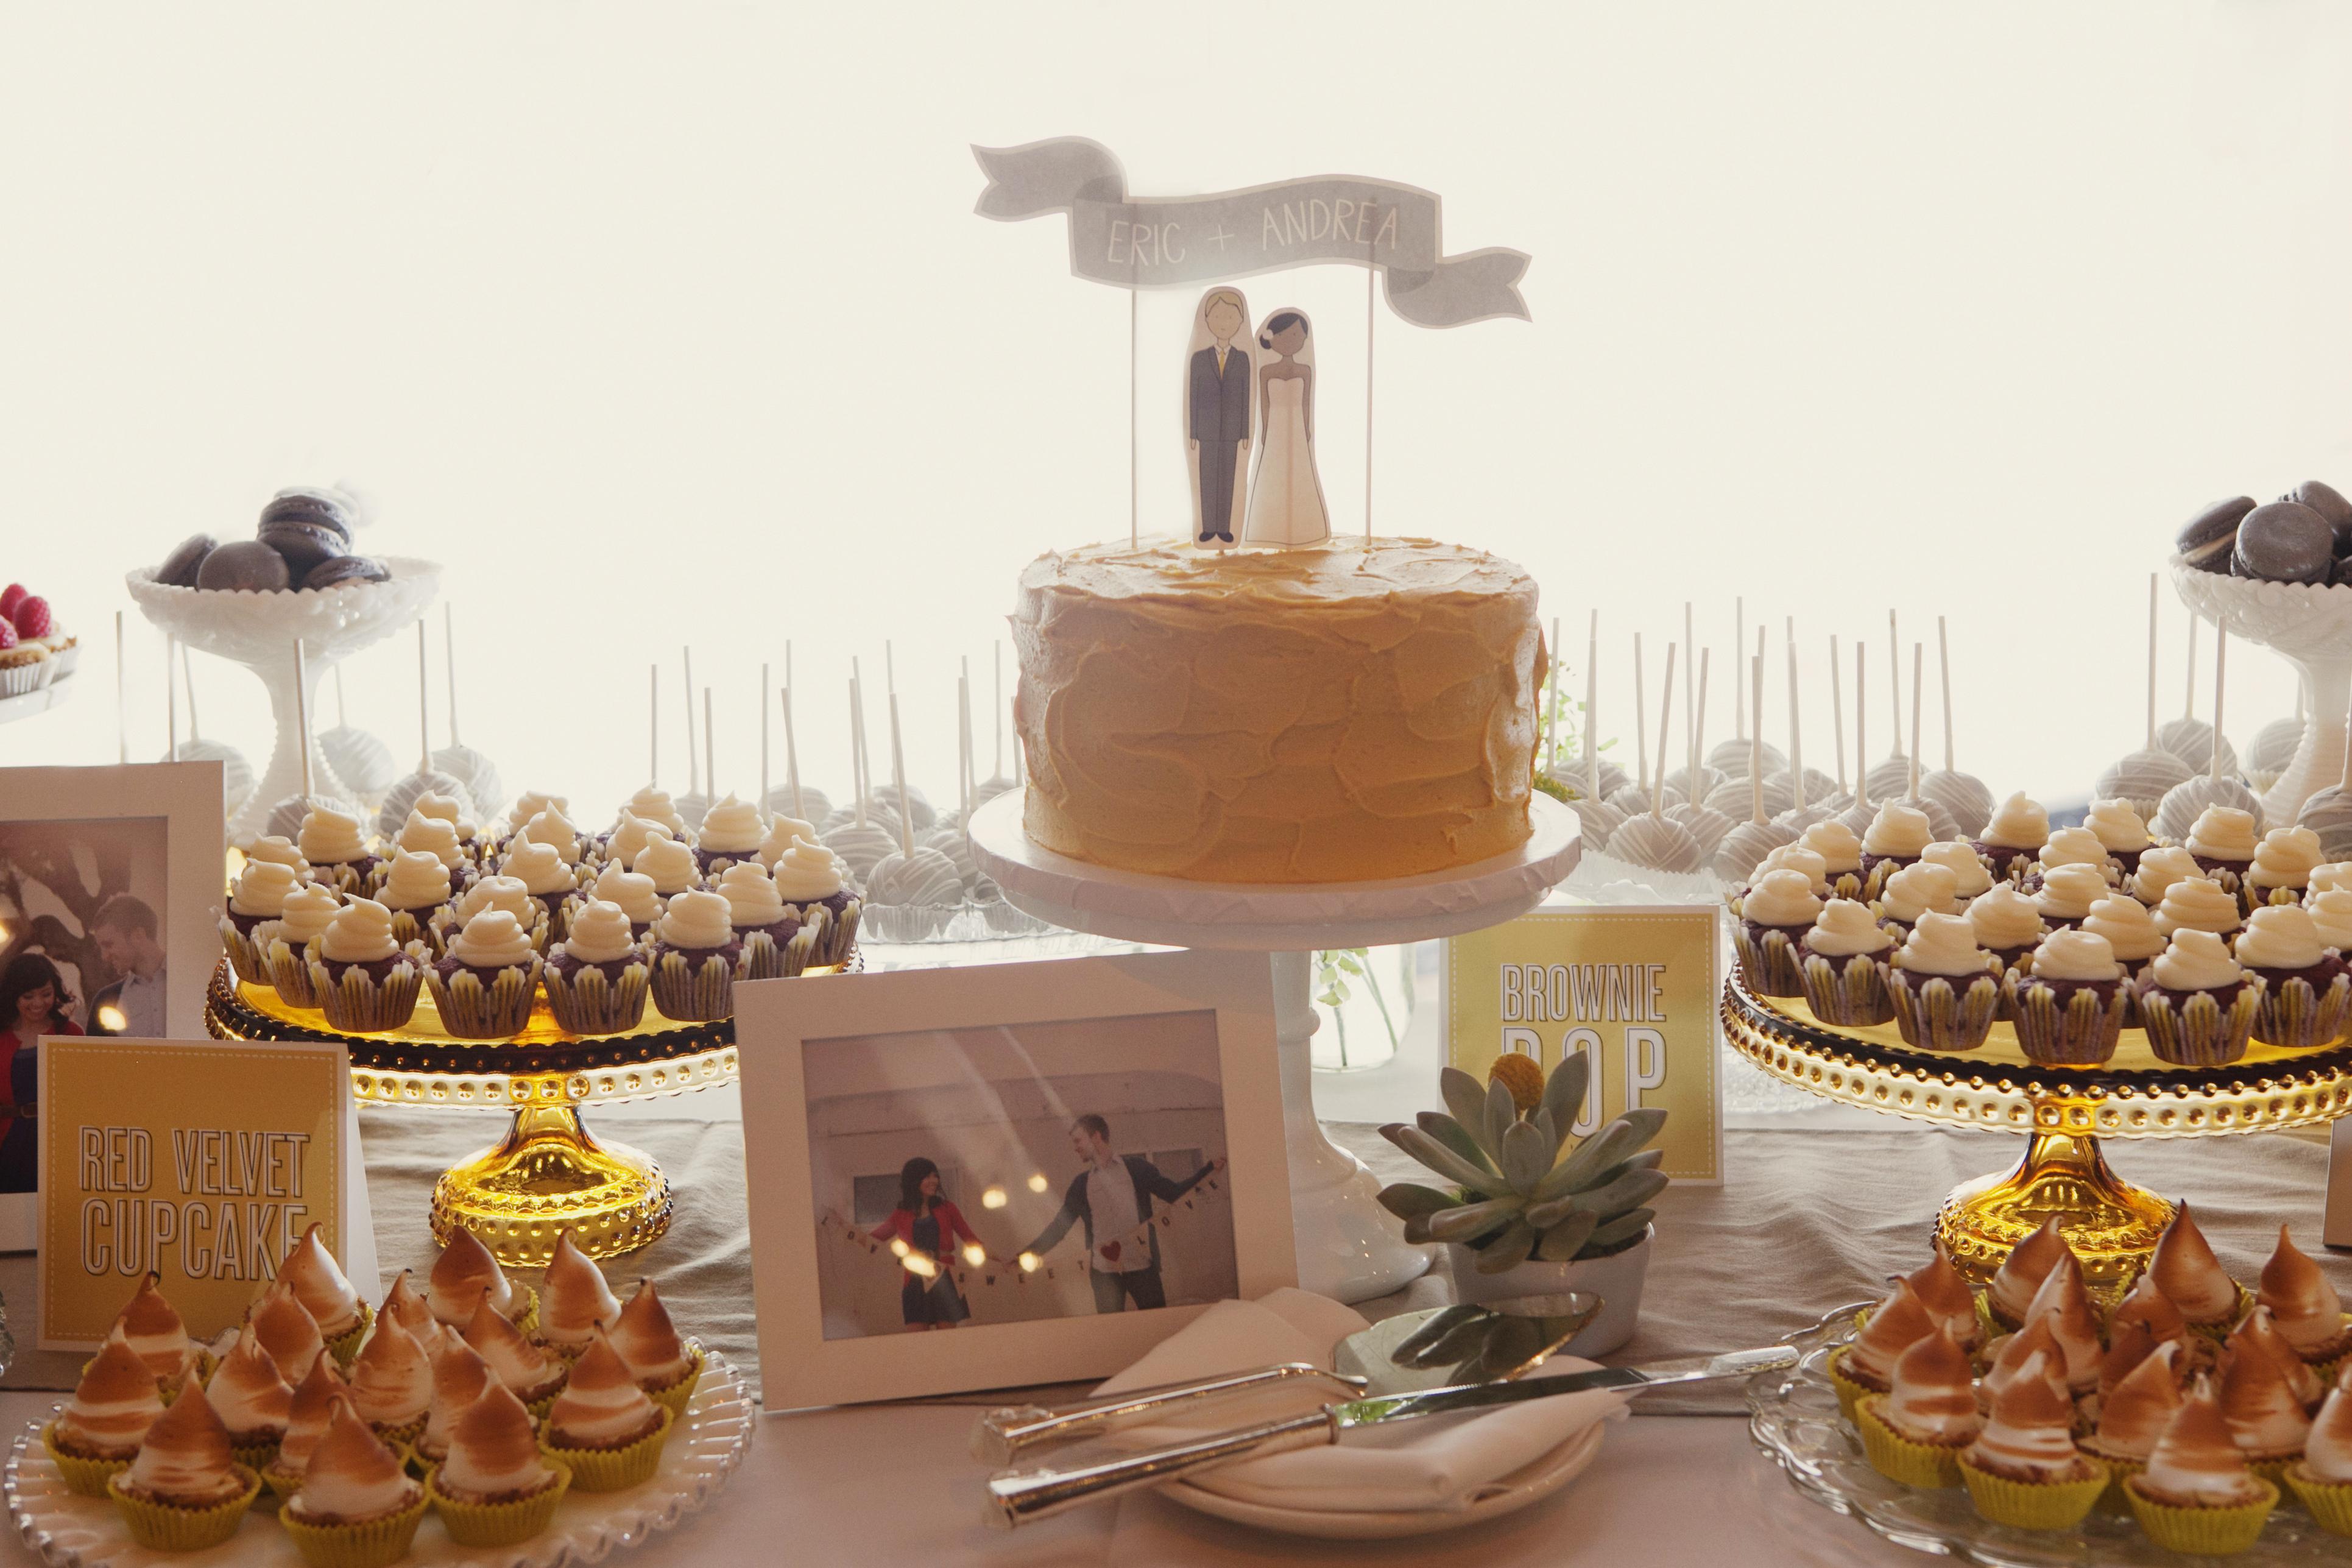 Cakes, cake, Cupcakes, Dessert, Bar, Tarts, Pops, Andrea eric